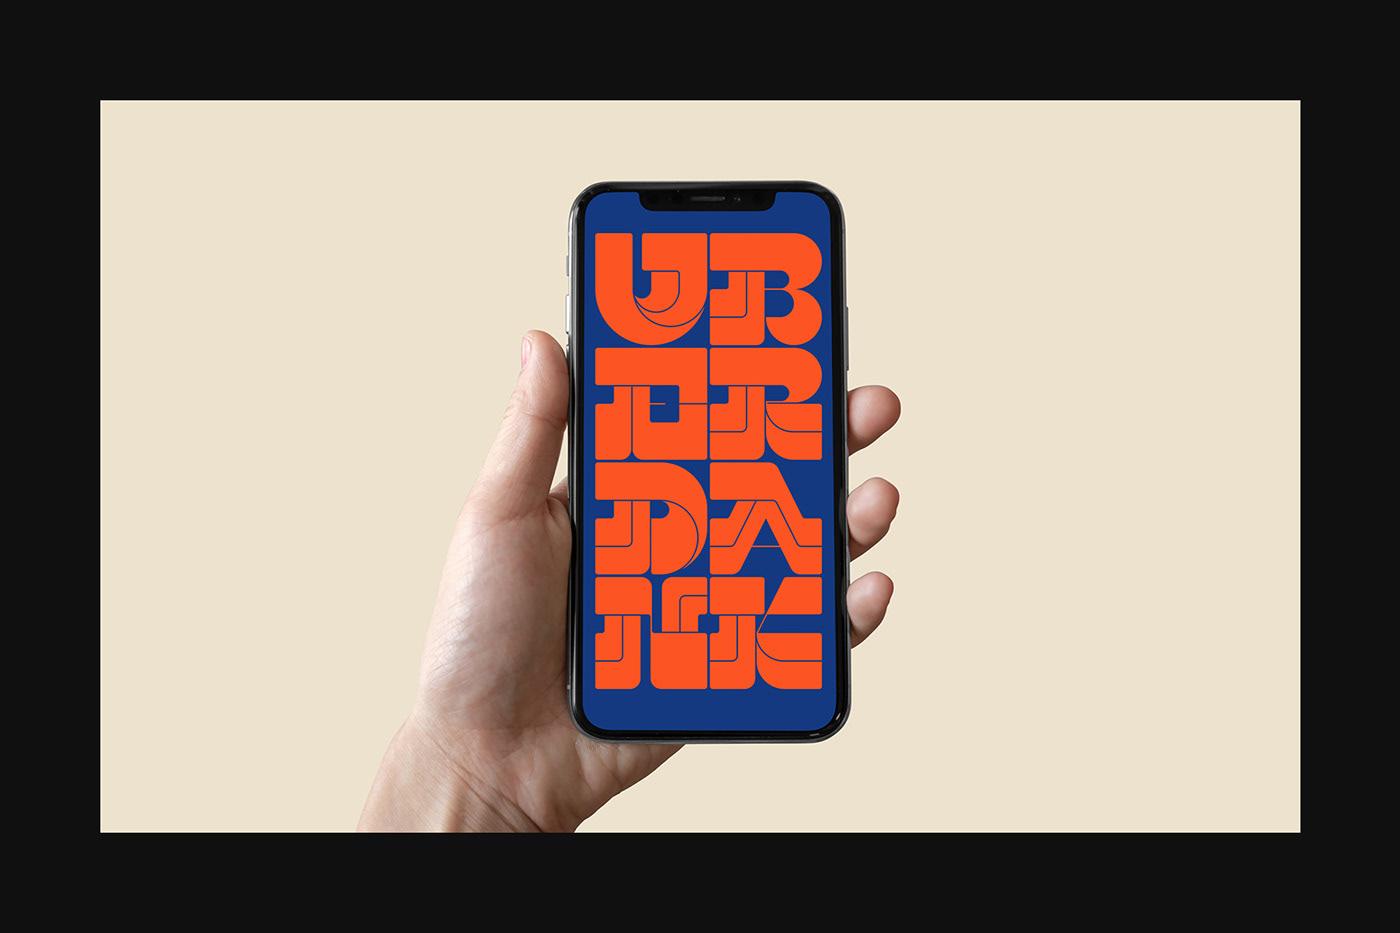 Thumbnail for Type Tuesday: Let's Get UBERDANK